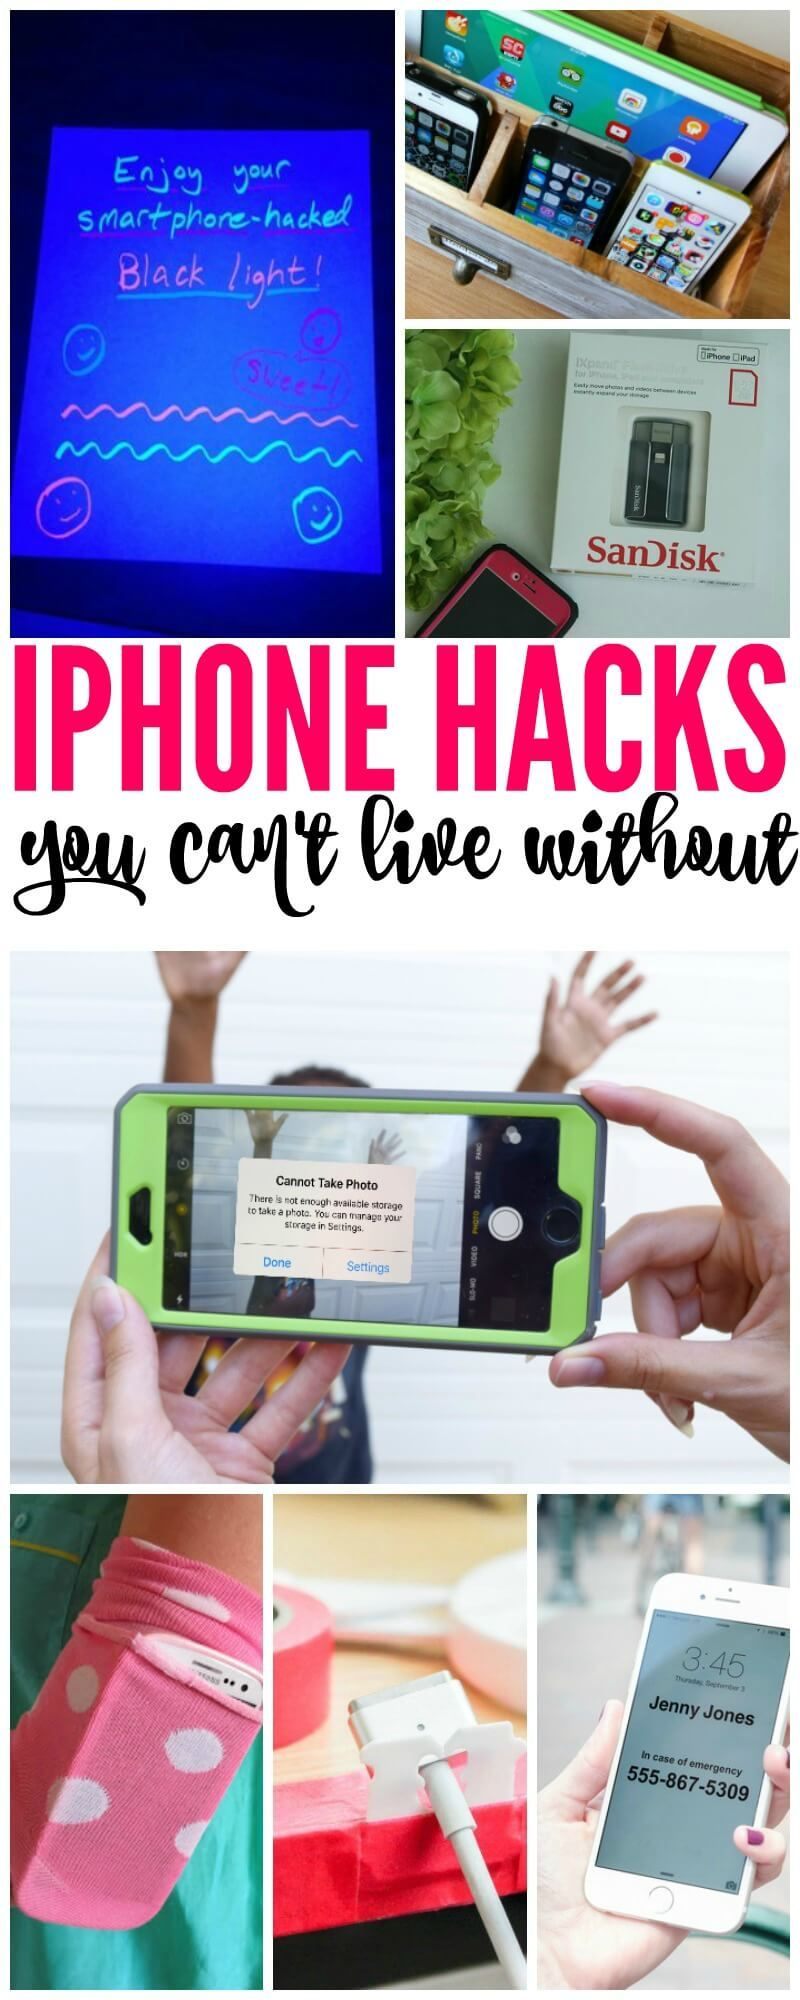 Z iPhone Hacks Pinterest | Tips | Cell phone hacks, Iphone